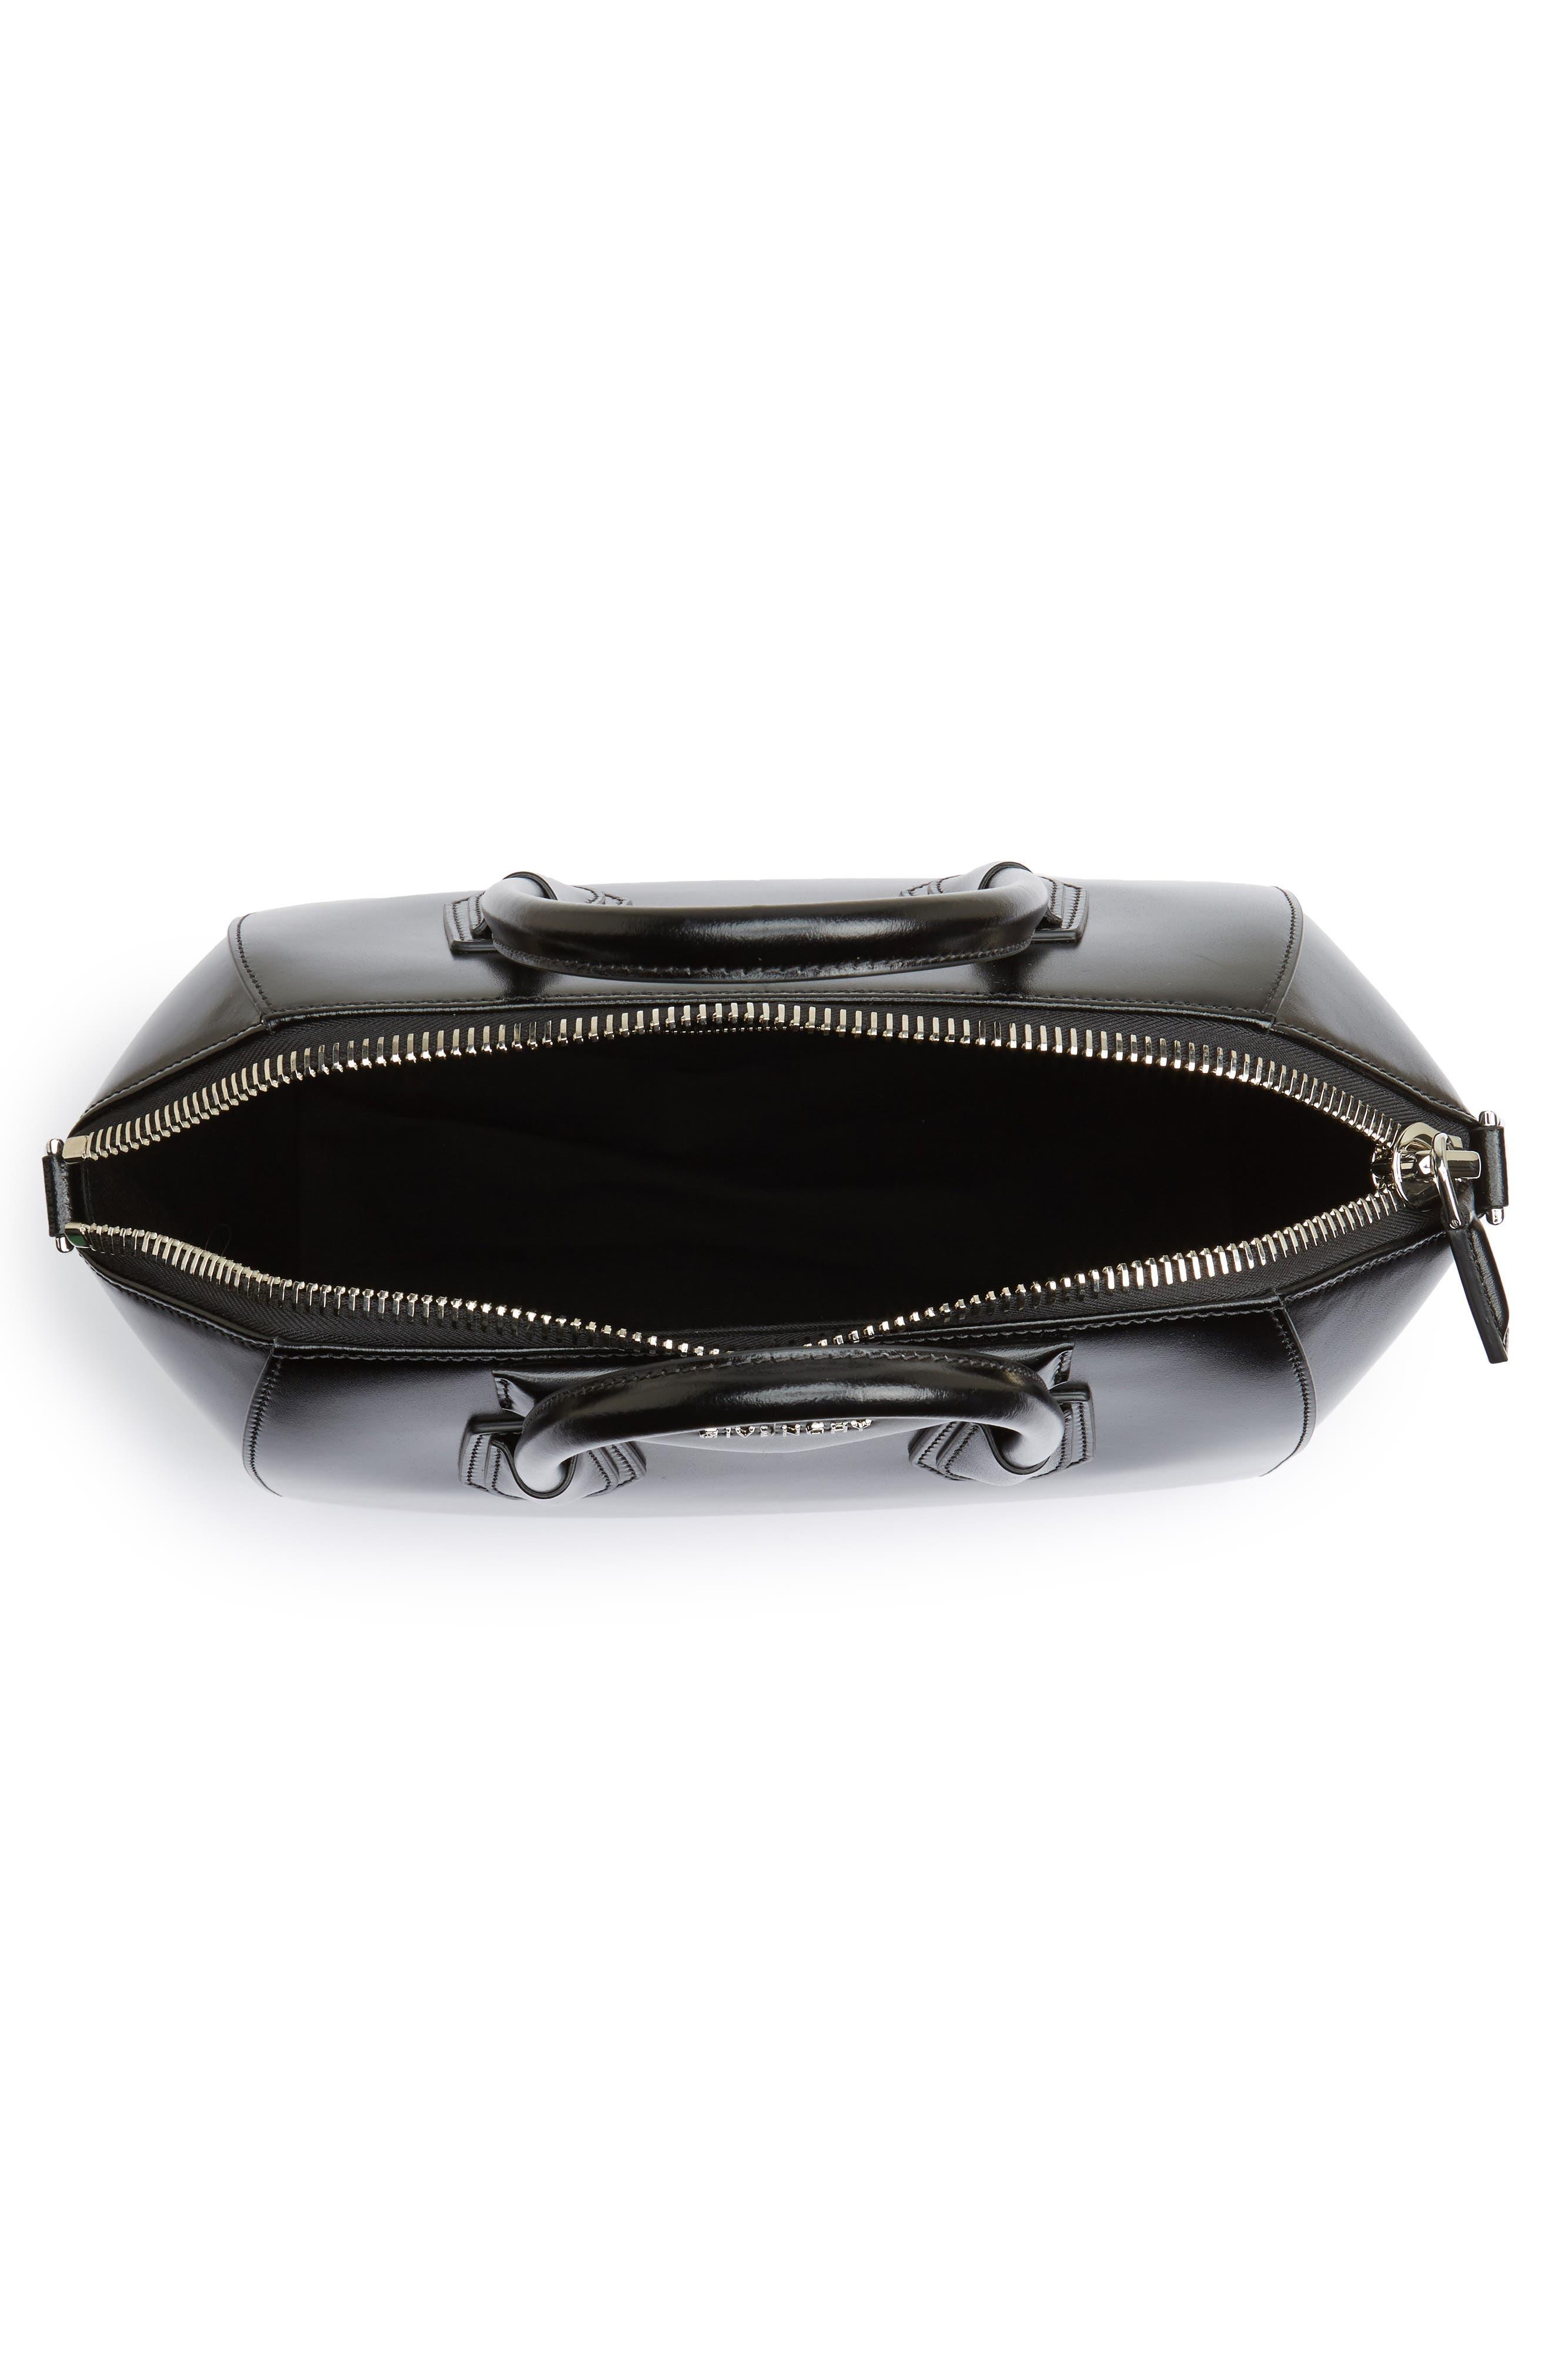 Medium Antigona Box Leather Satchel,                             Alternate thumbnail 4, color,                             001